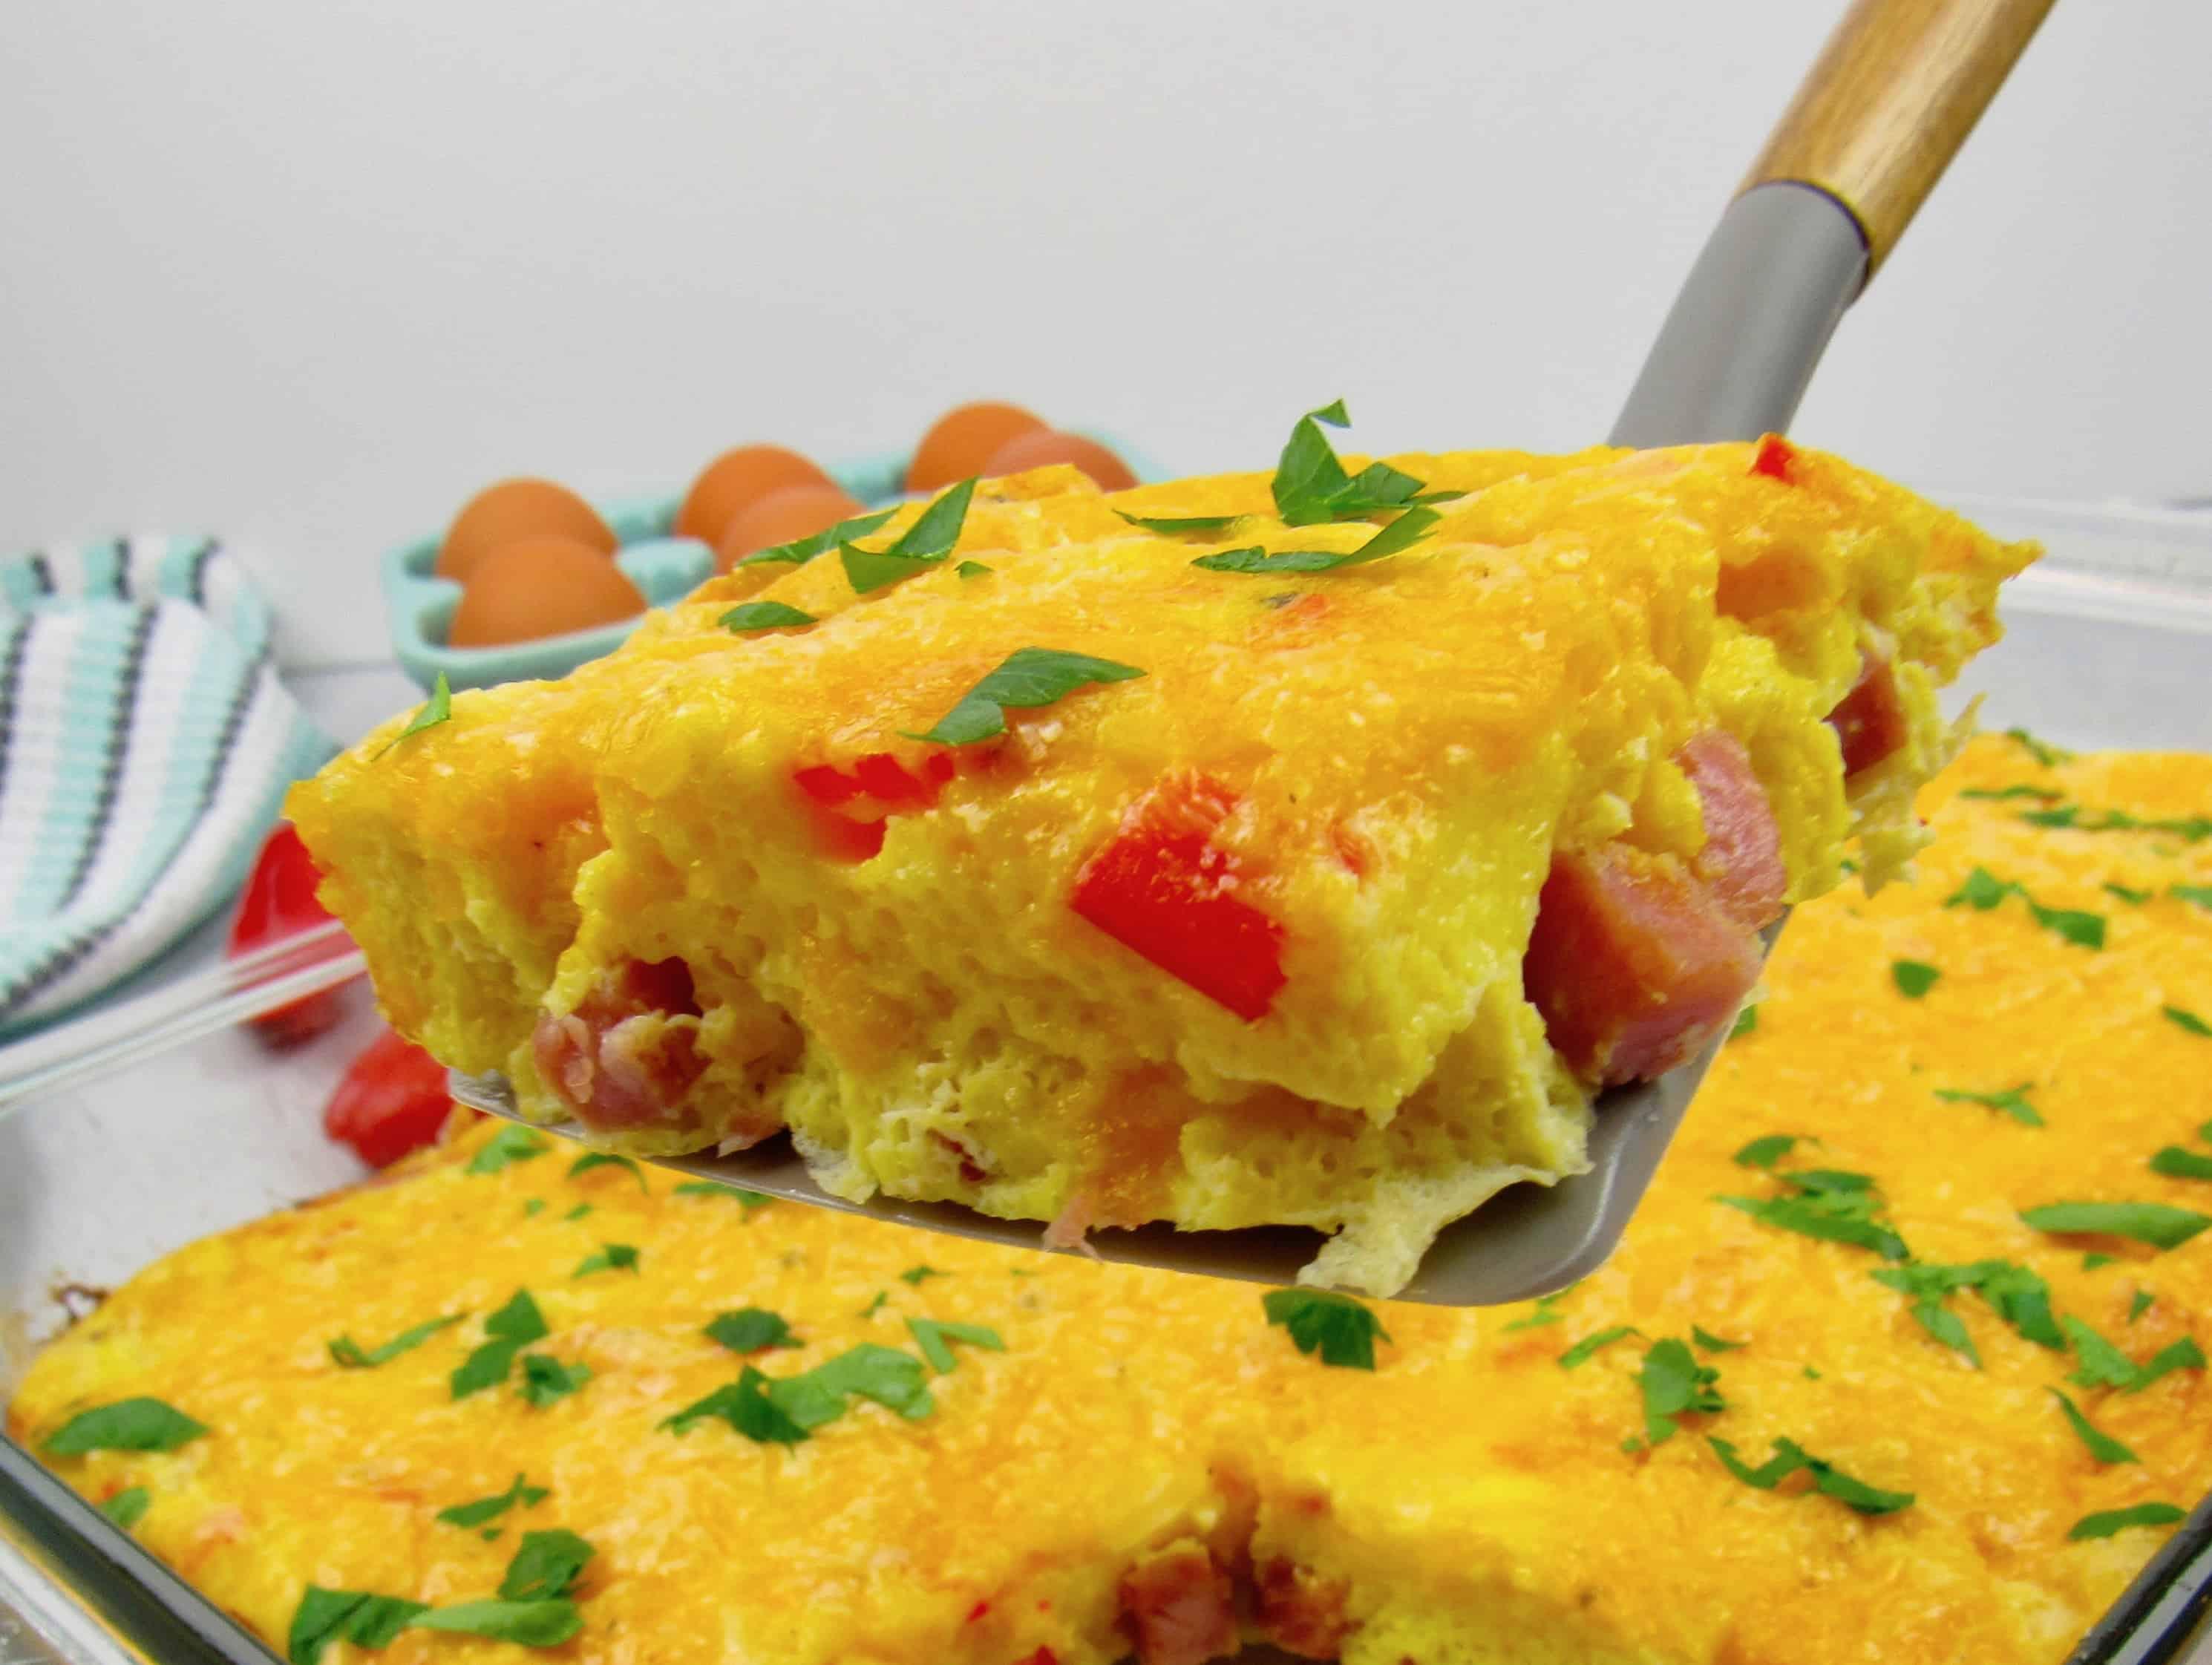 breakfast casserole slice held up with spatula